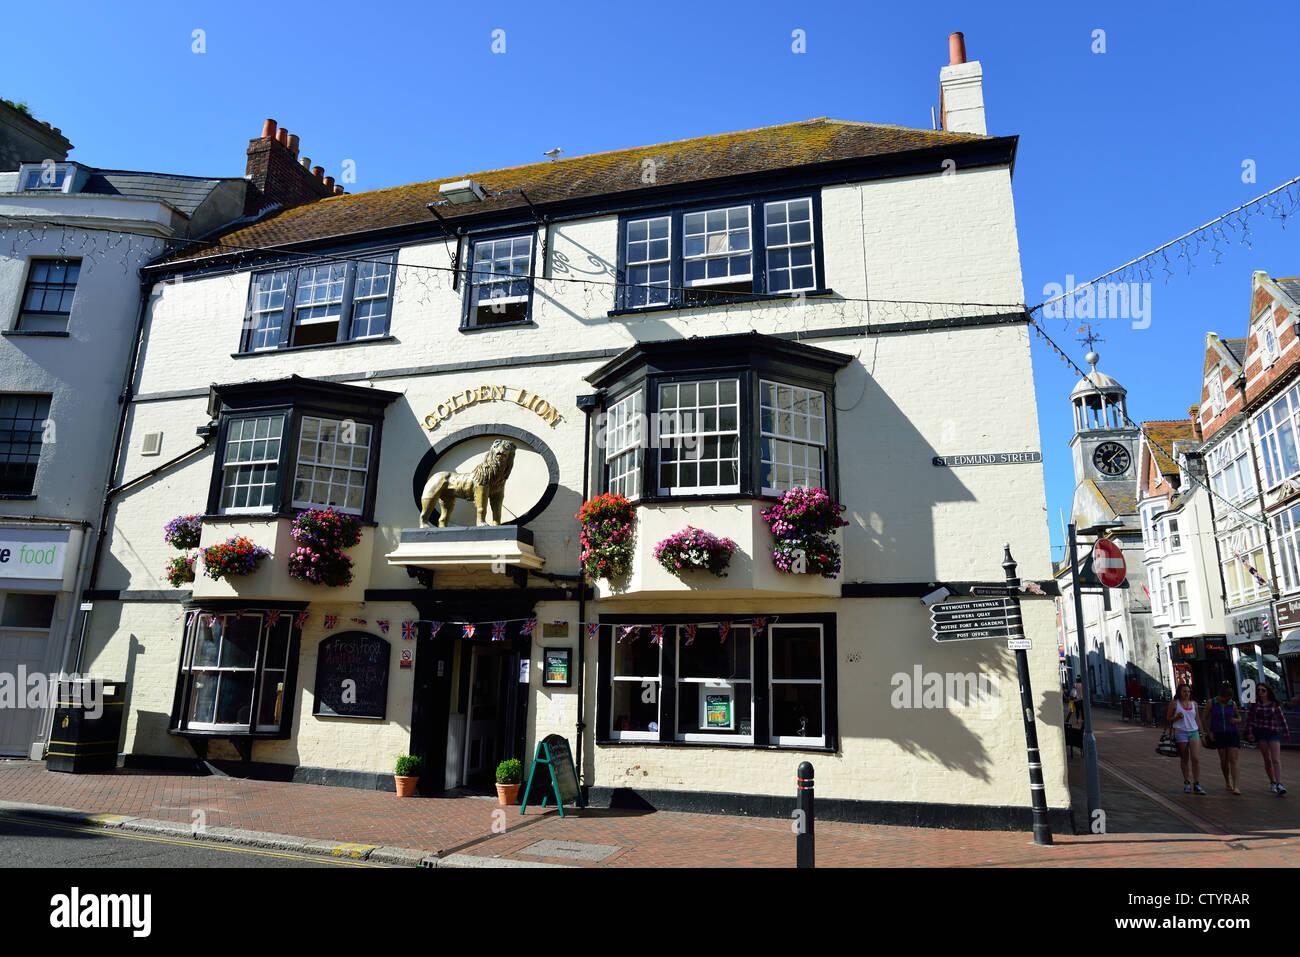 golden lion pub st edmund street weymouth dorset